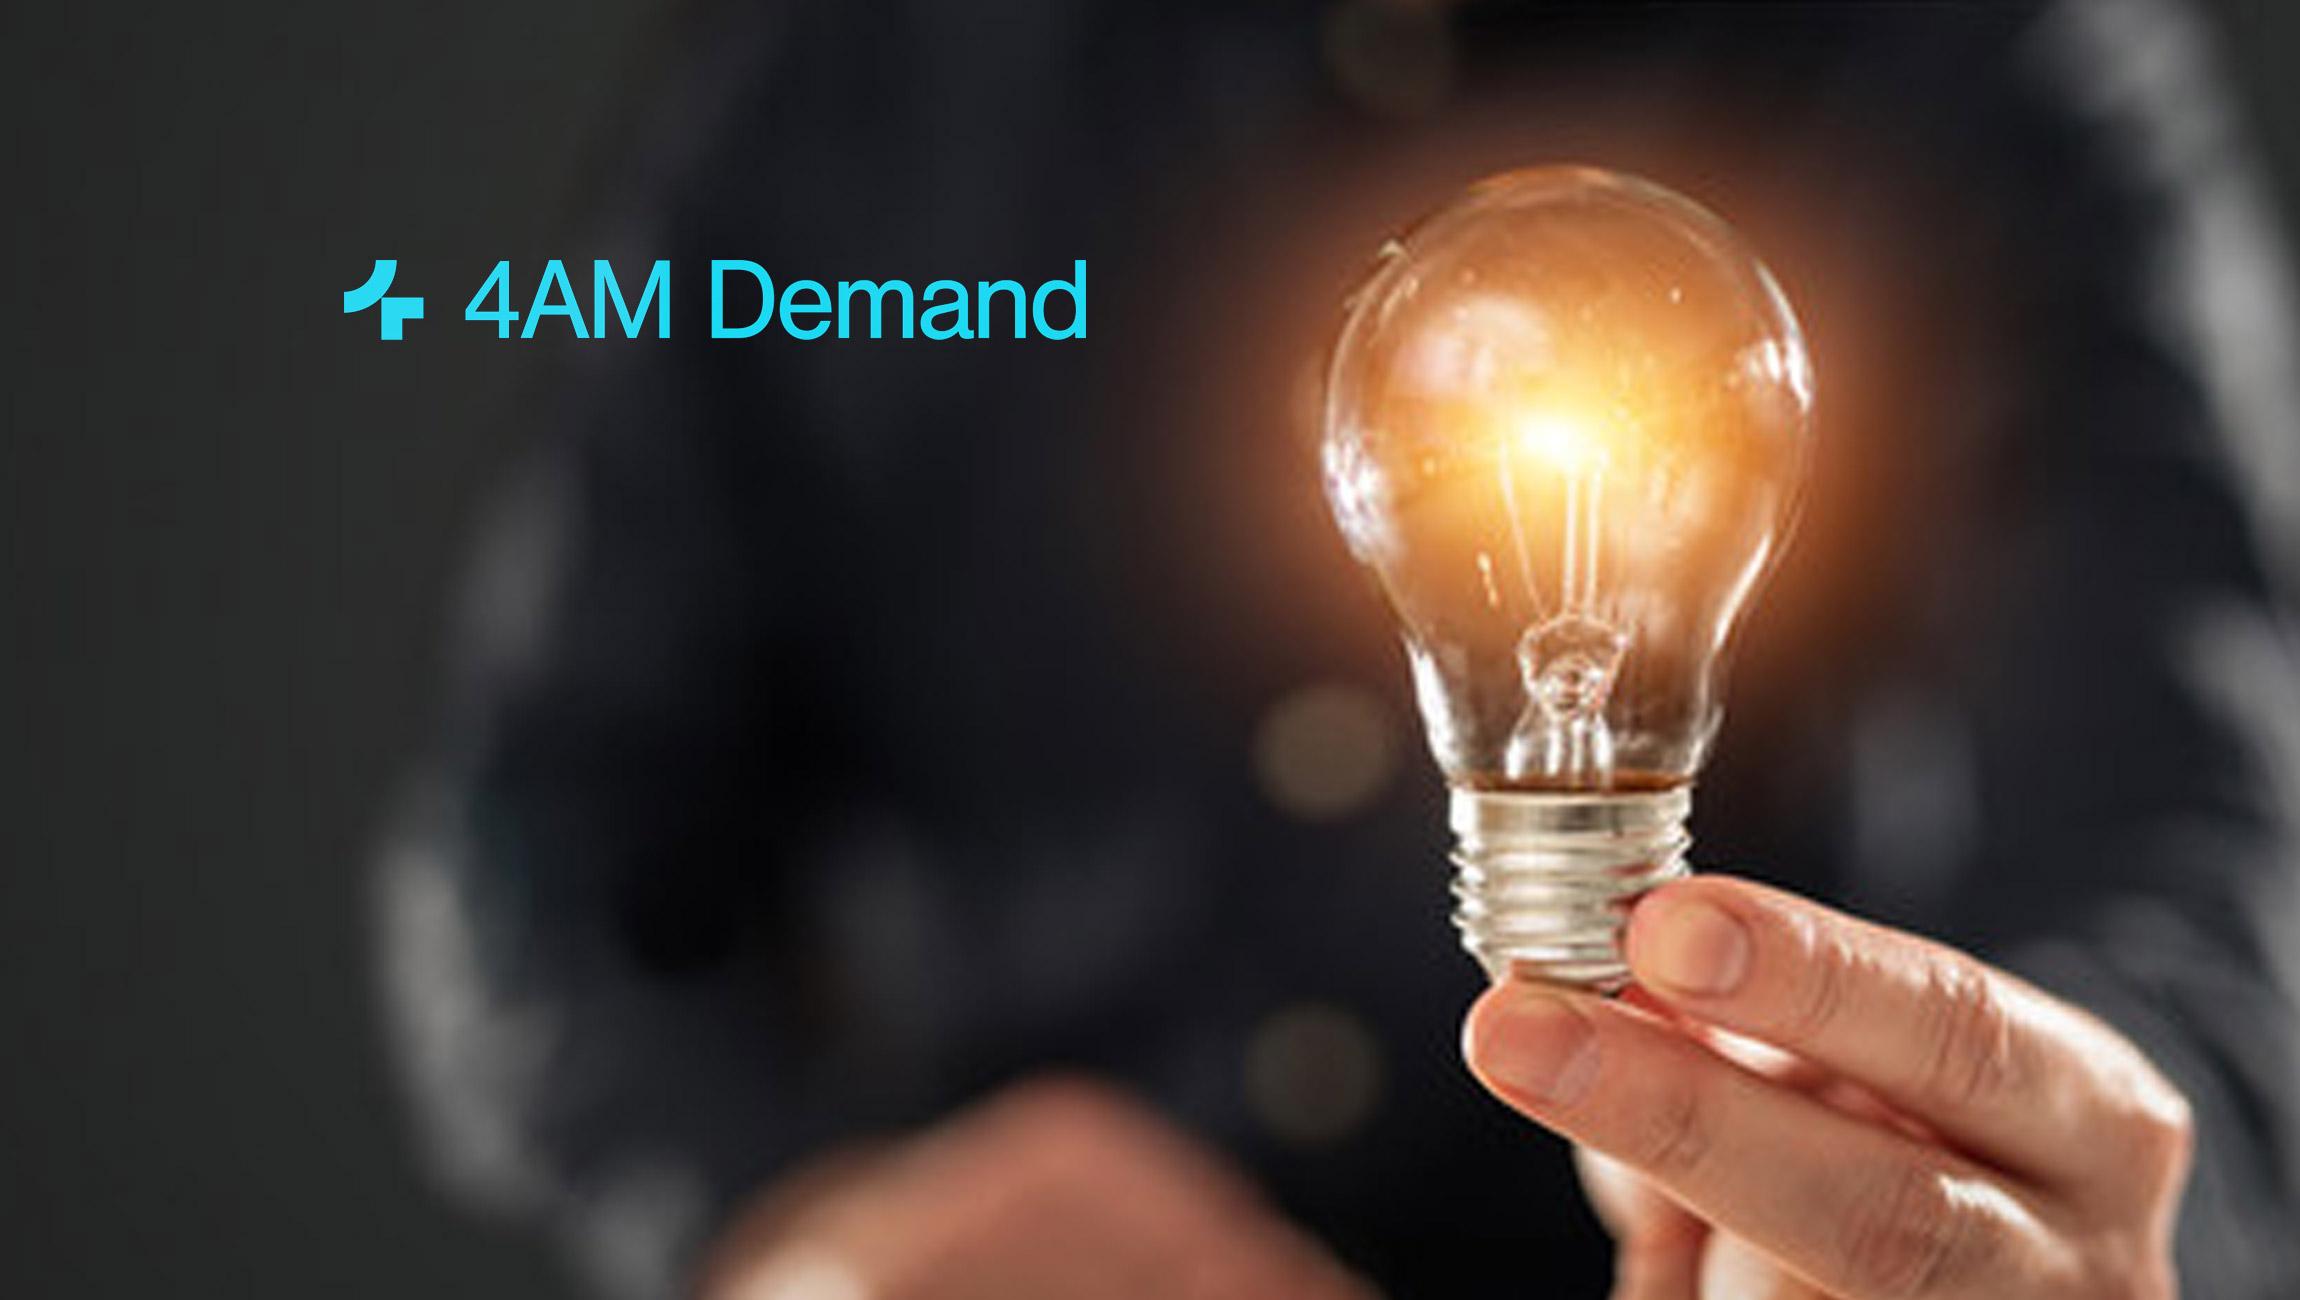 BtoB Marketing Veterans Launch New Company 4AM Demand